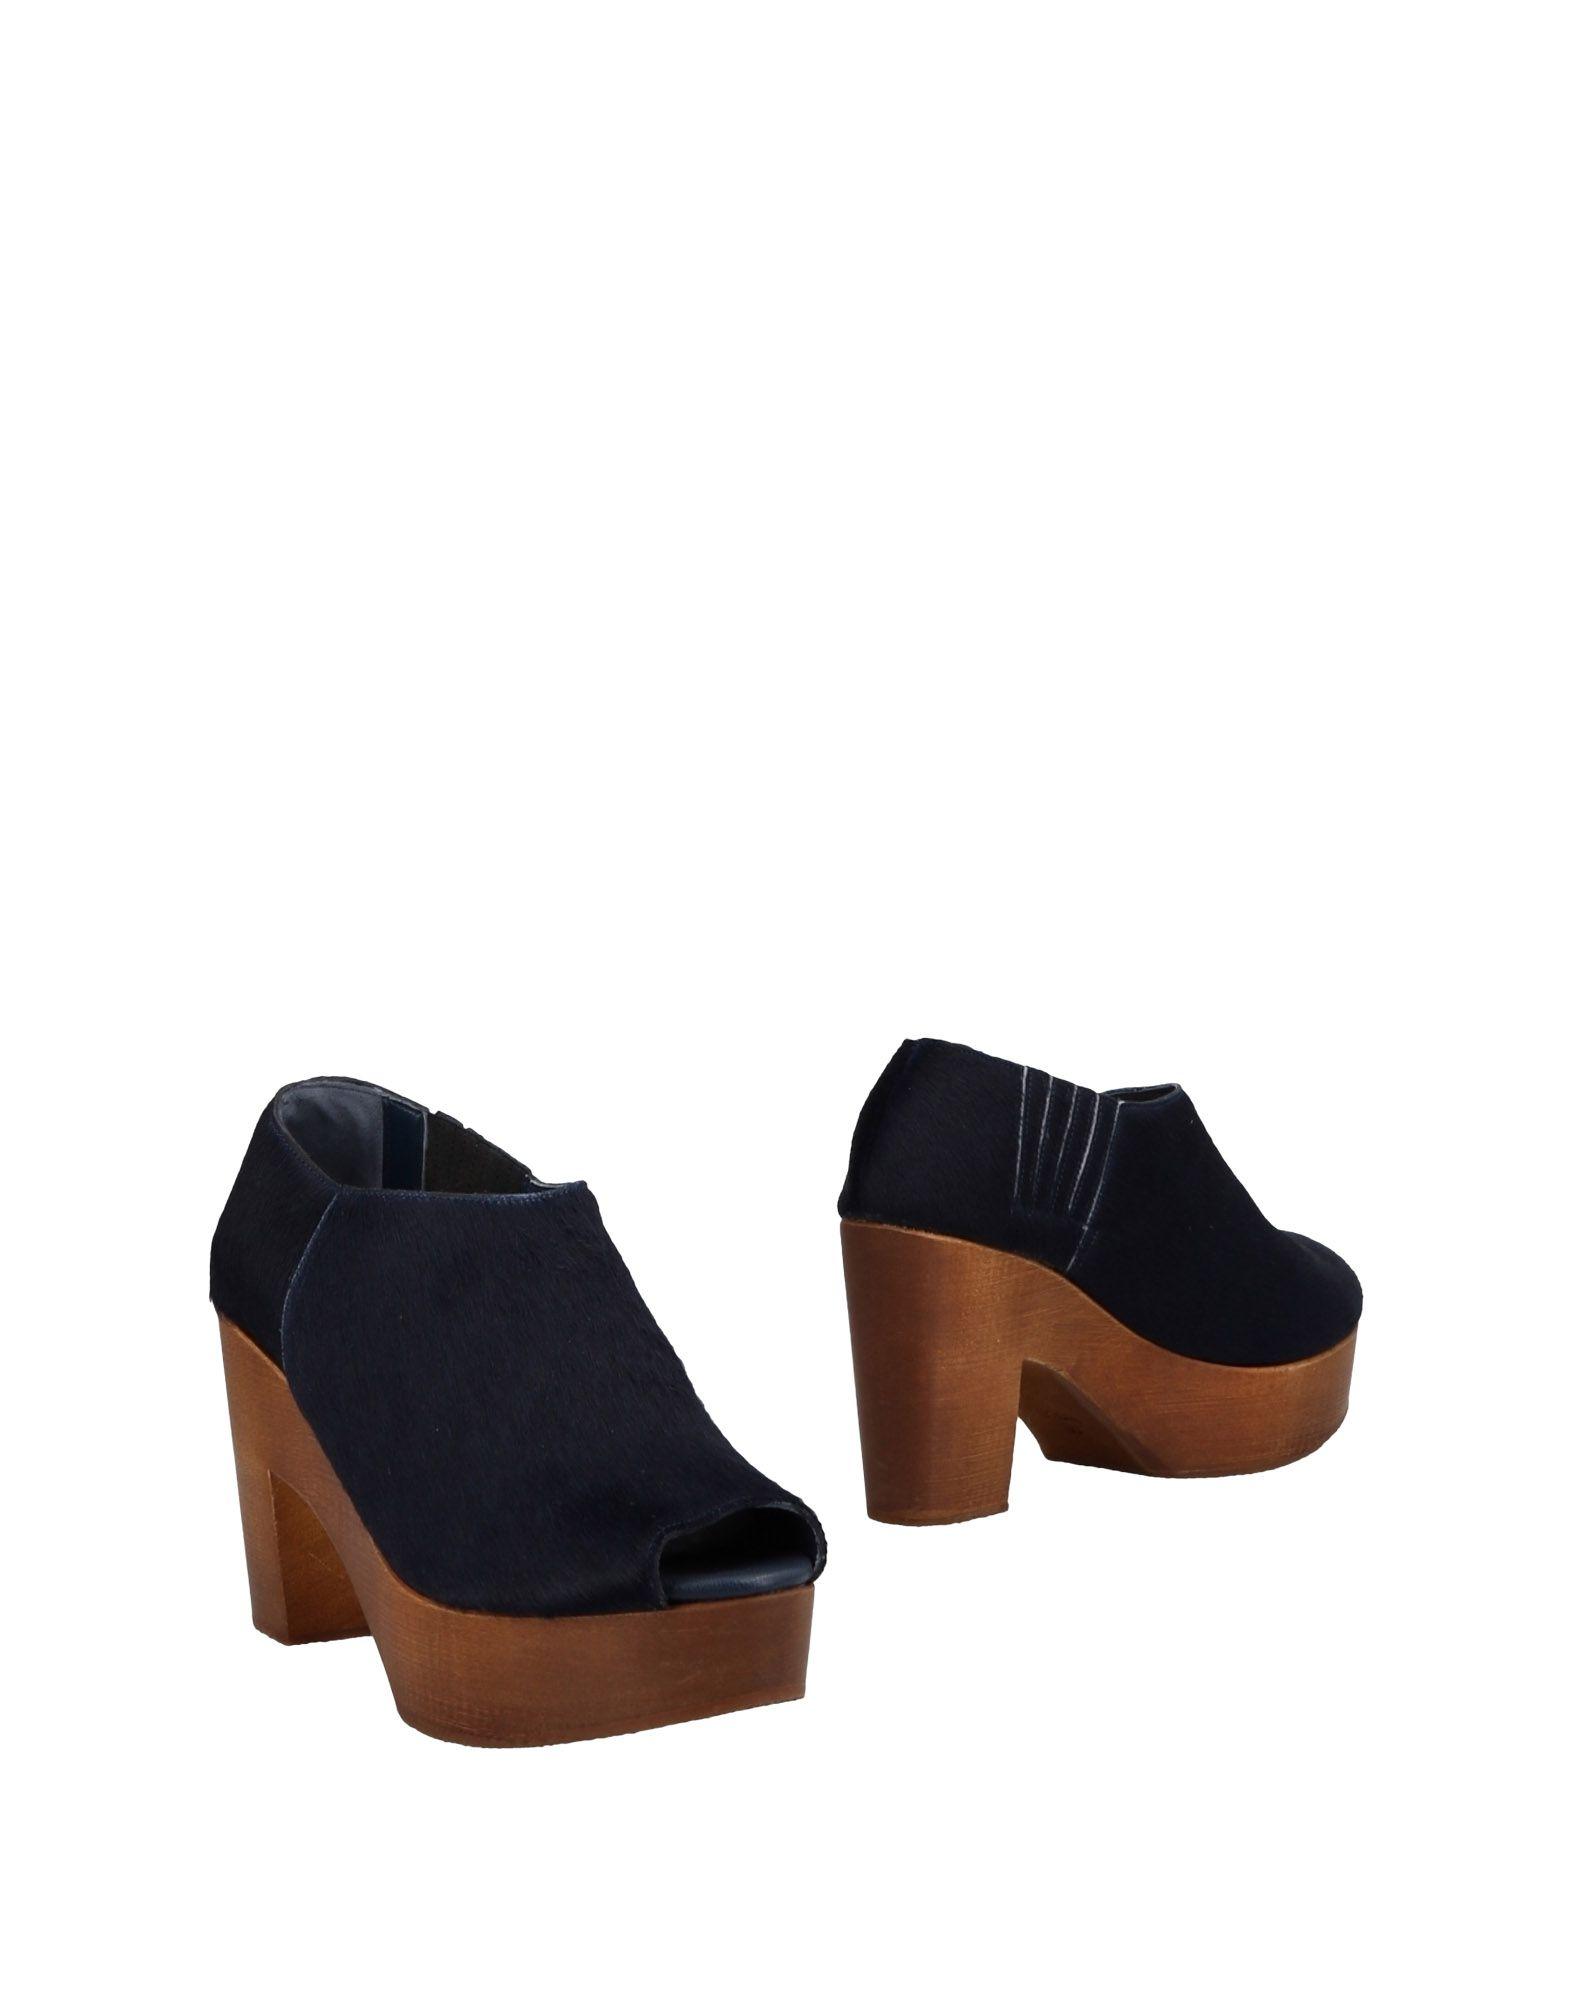 Antidoti Stiefelette Damen   11482010VI Heiße Schuhe 8189cd